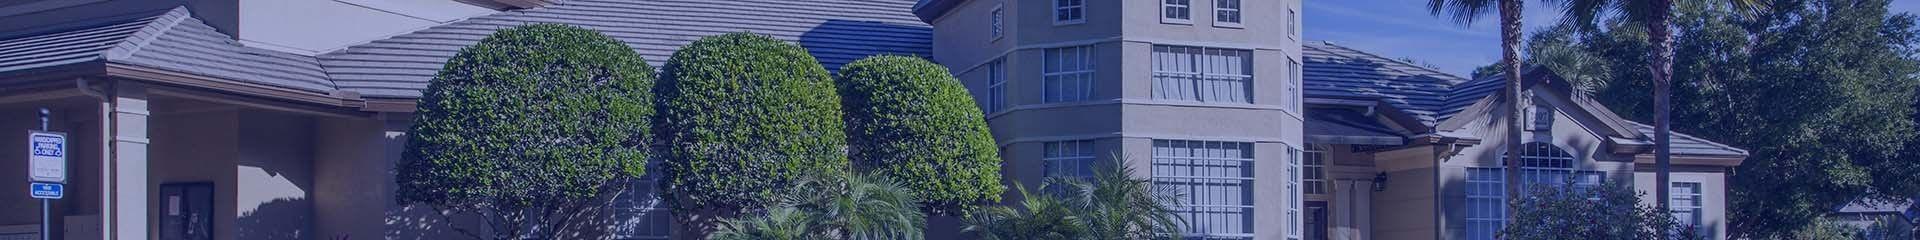 Orlando, FL Apartments